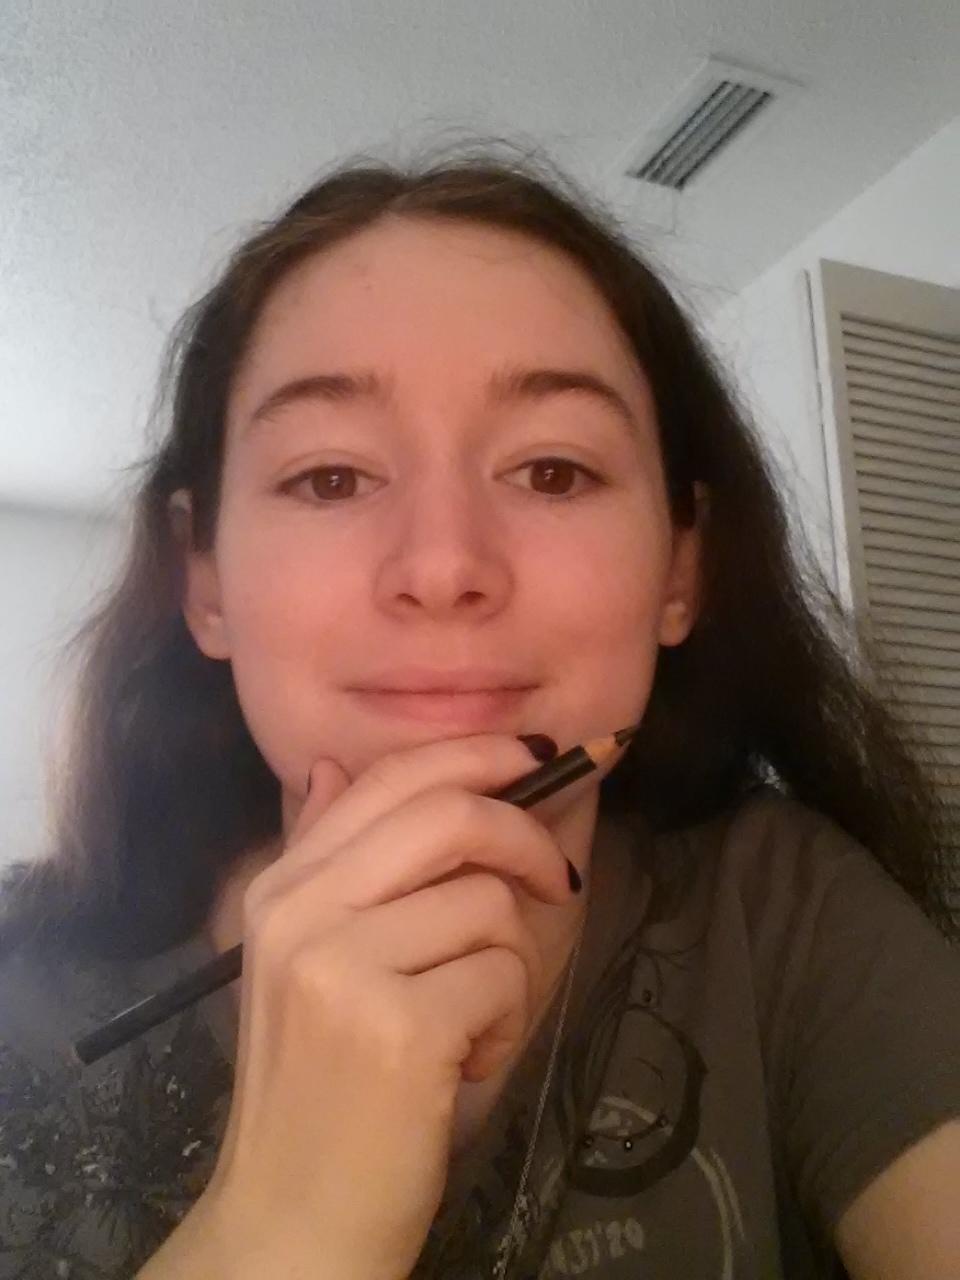 TwilightFoxx's Profile Picture